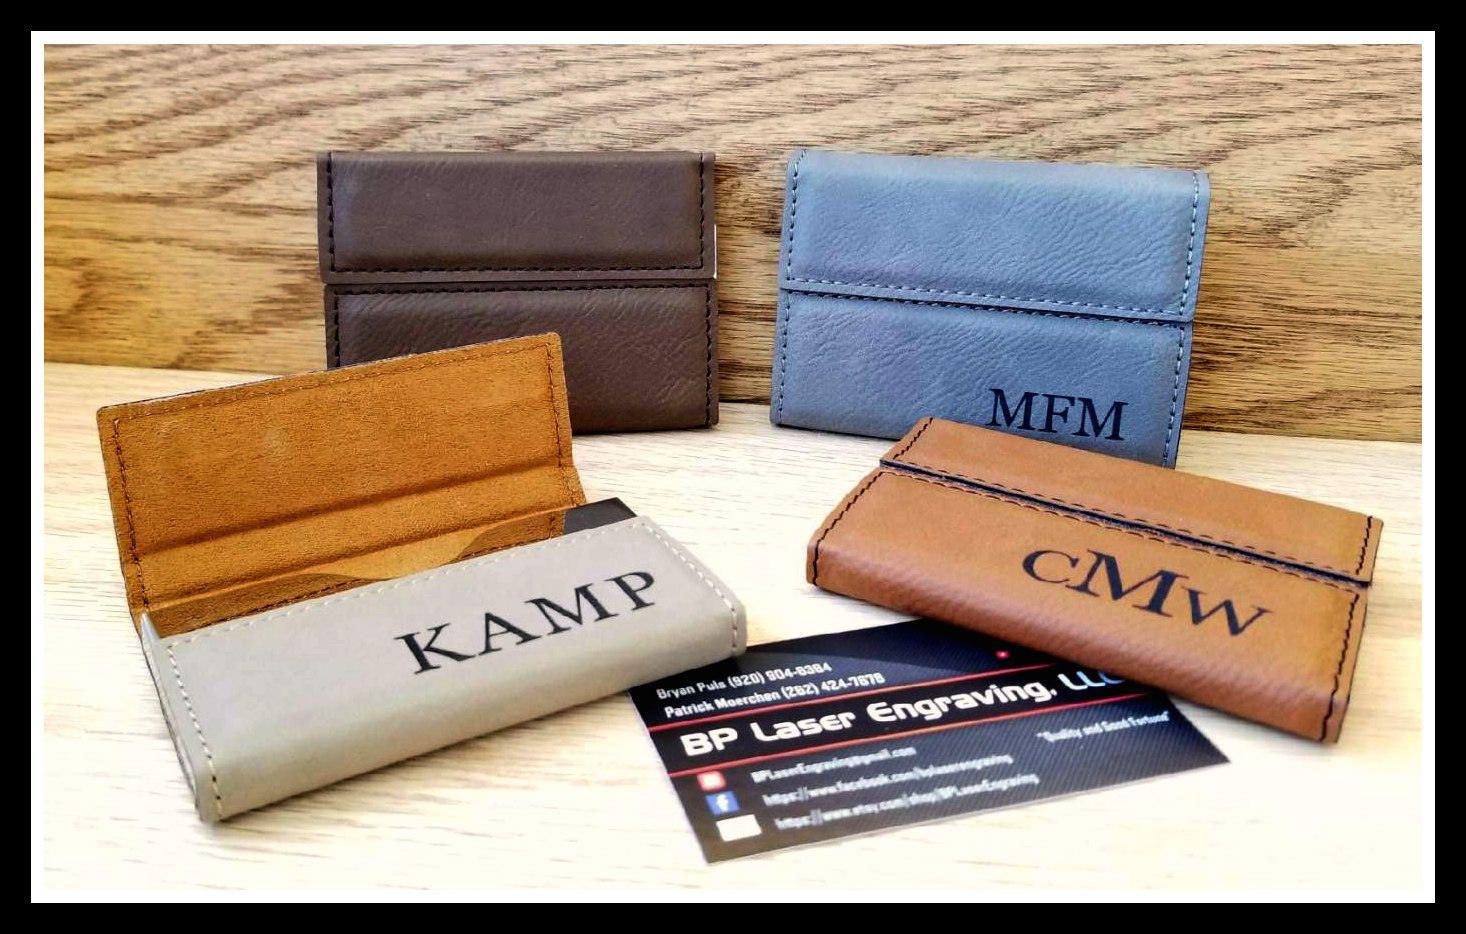 Business Card Holder Custom Leather Business Card Holder Etsy Leather Business Cards Corporate Gifts Leather Business Card Holder